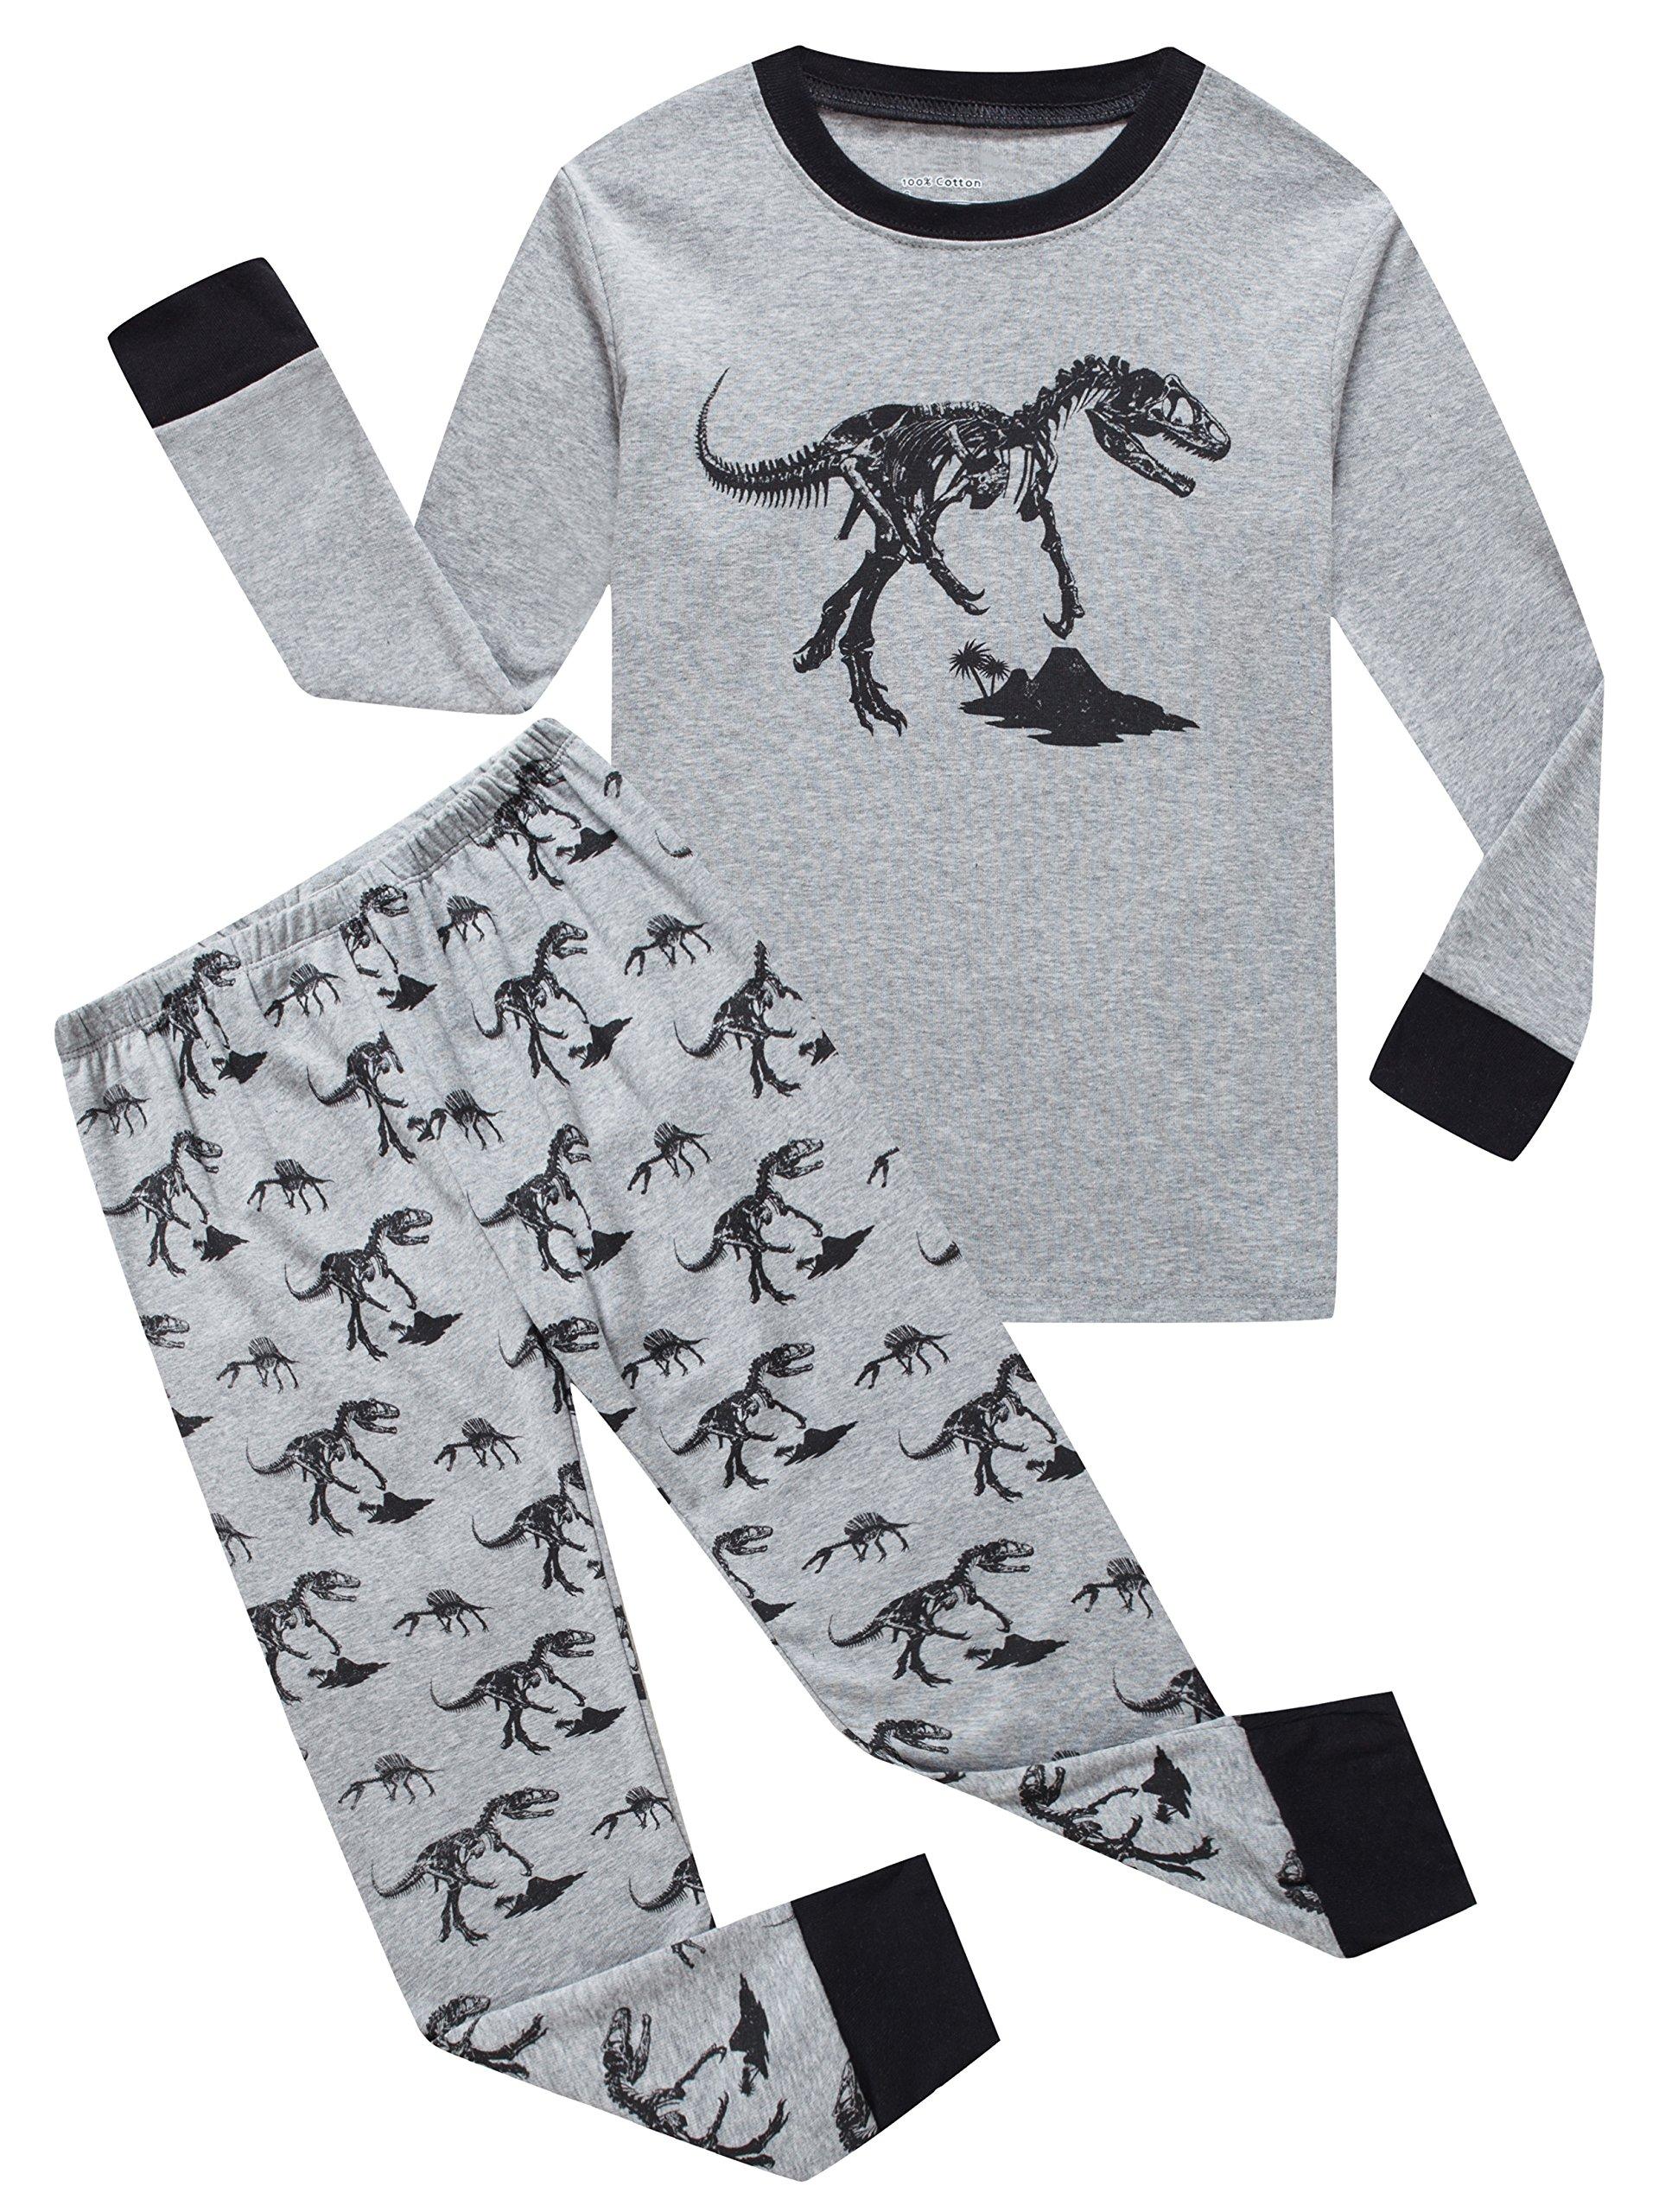 940da544faff Galleon - IF Pajamas Dinosaur Little Girls Boys Pjs 100% Cotton Long ...